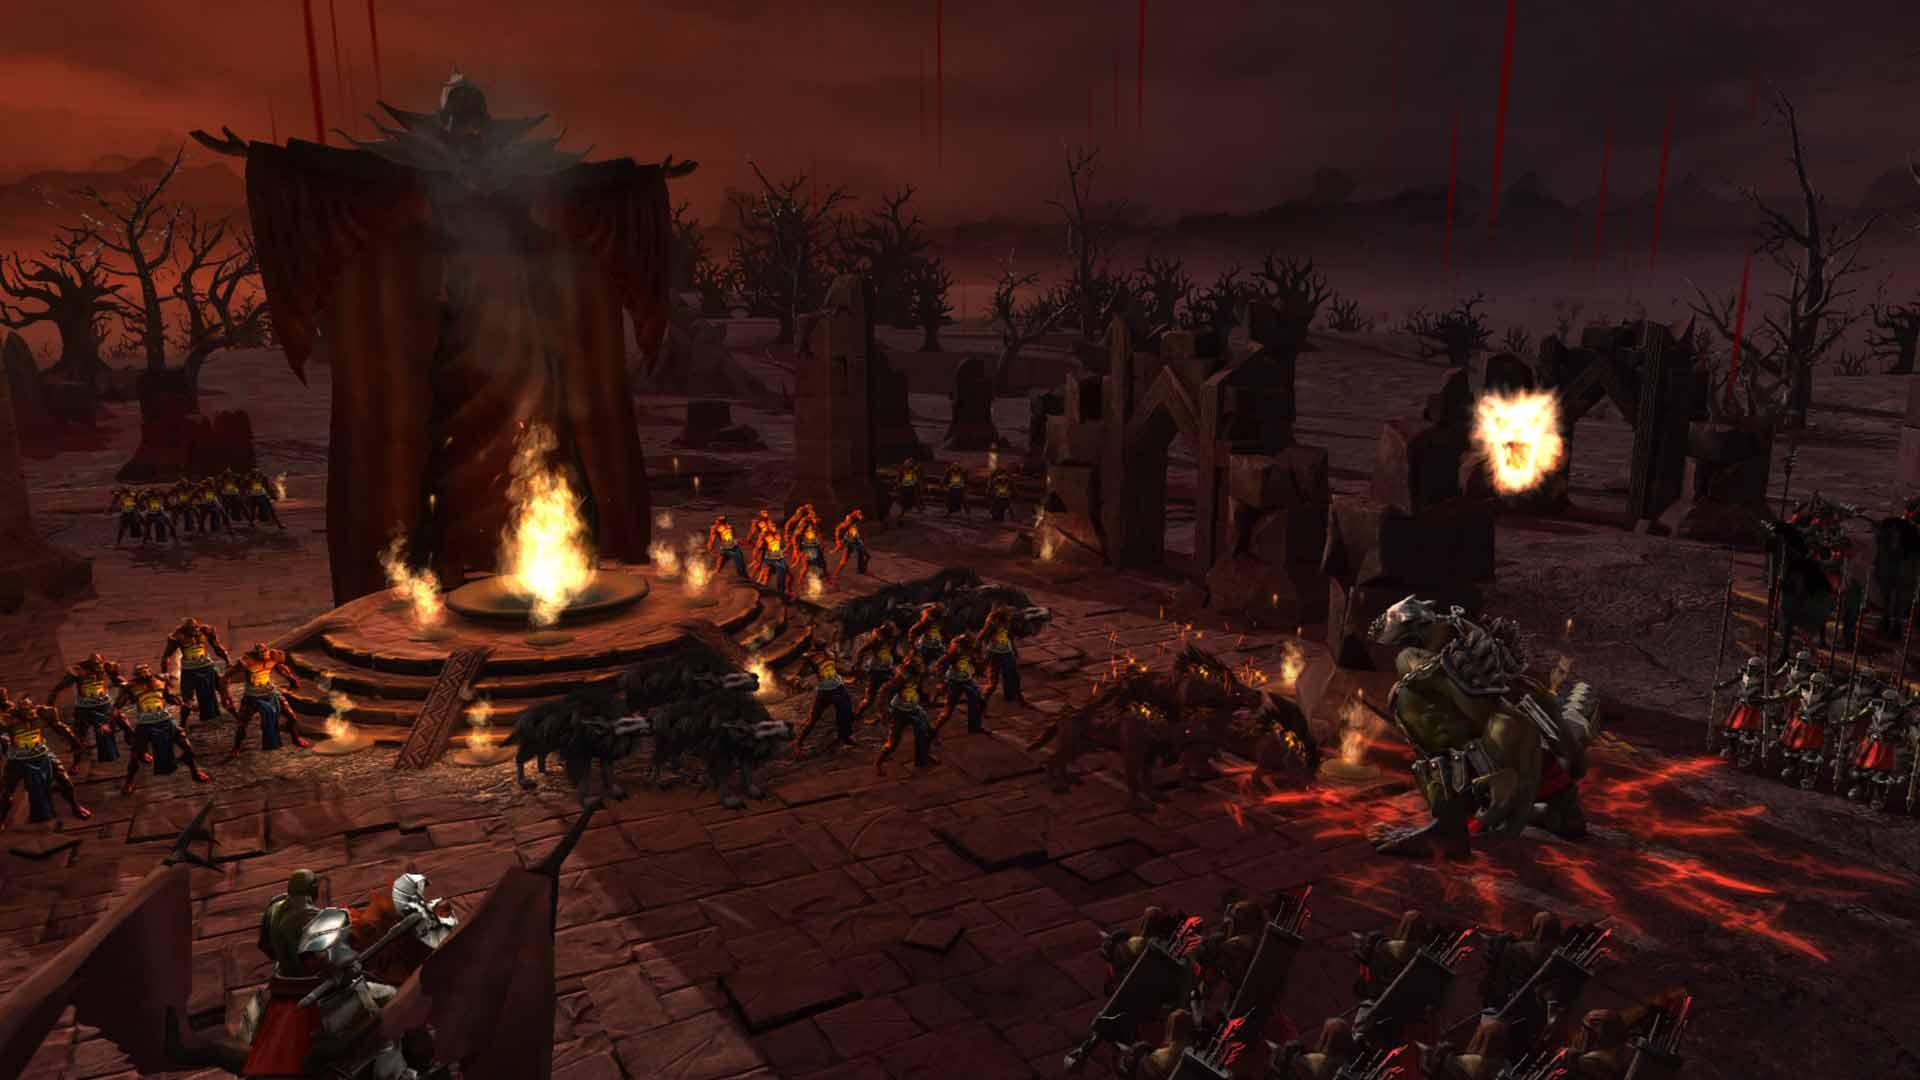 Age of Wonders III Deluxe Edition game image